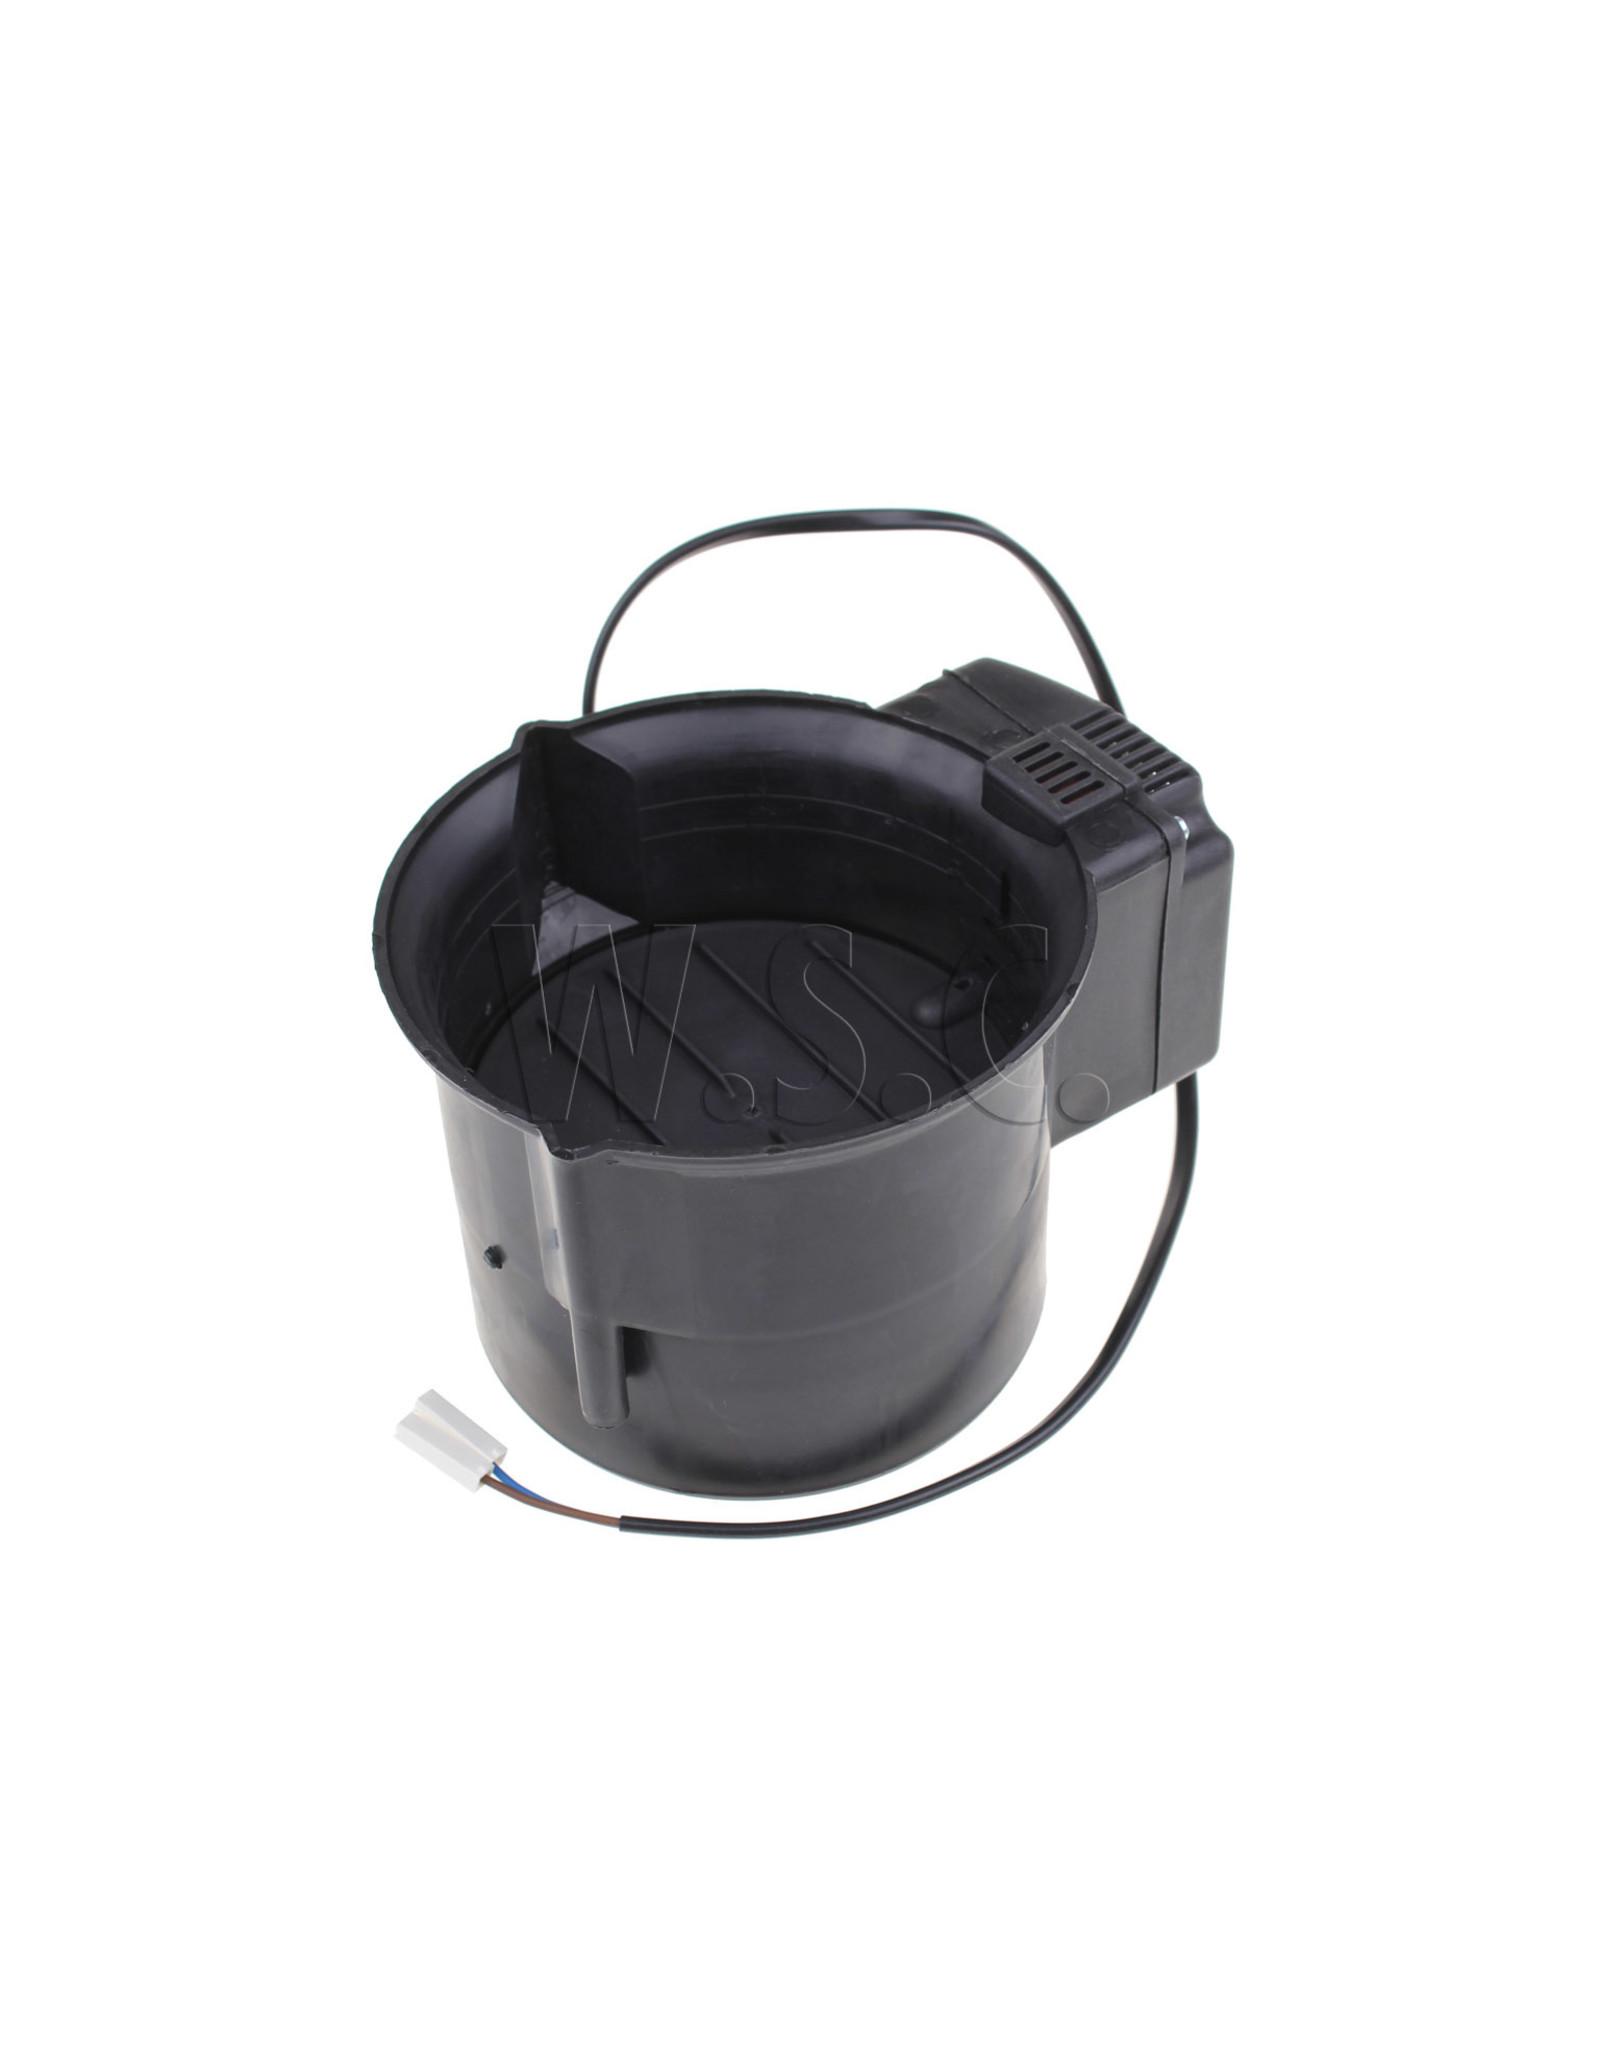 Whirlpool ventiel - ventilatormotor